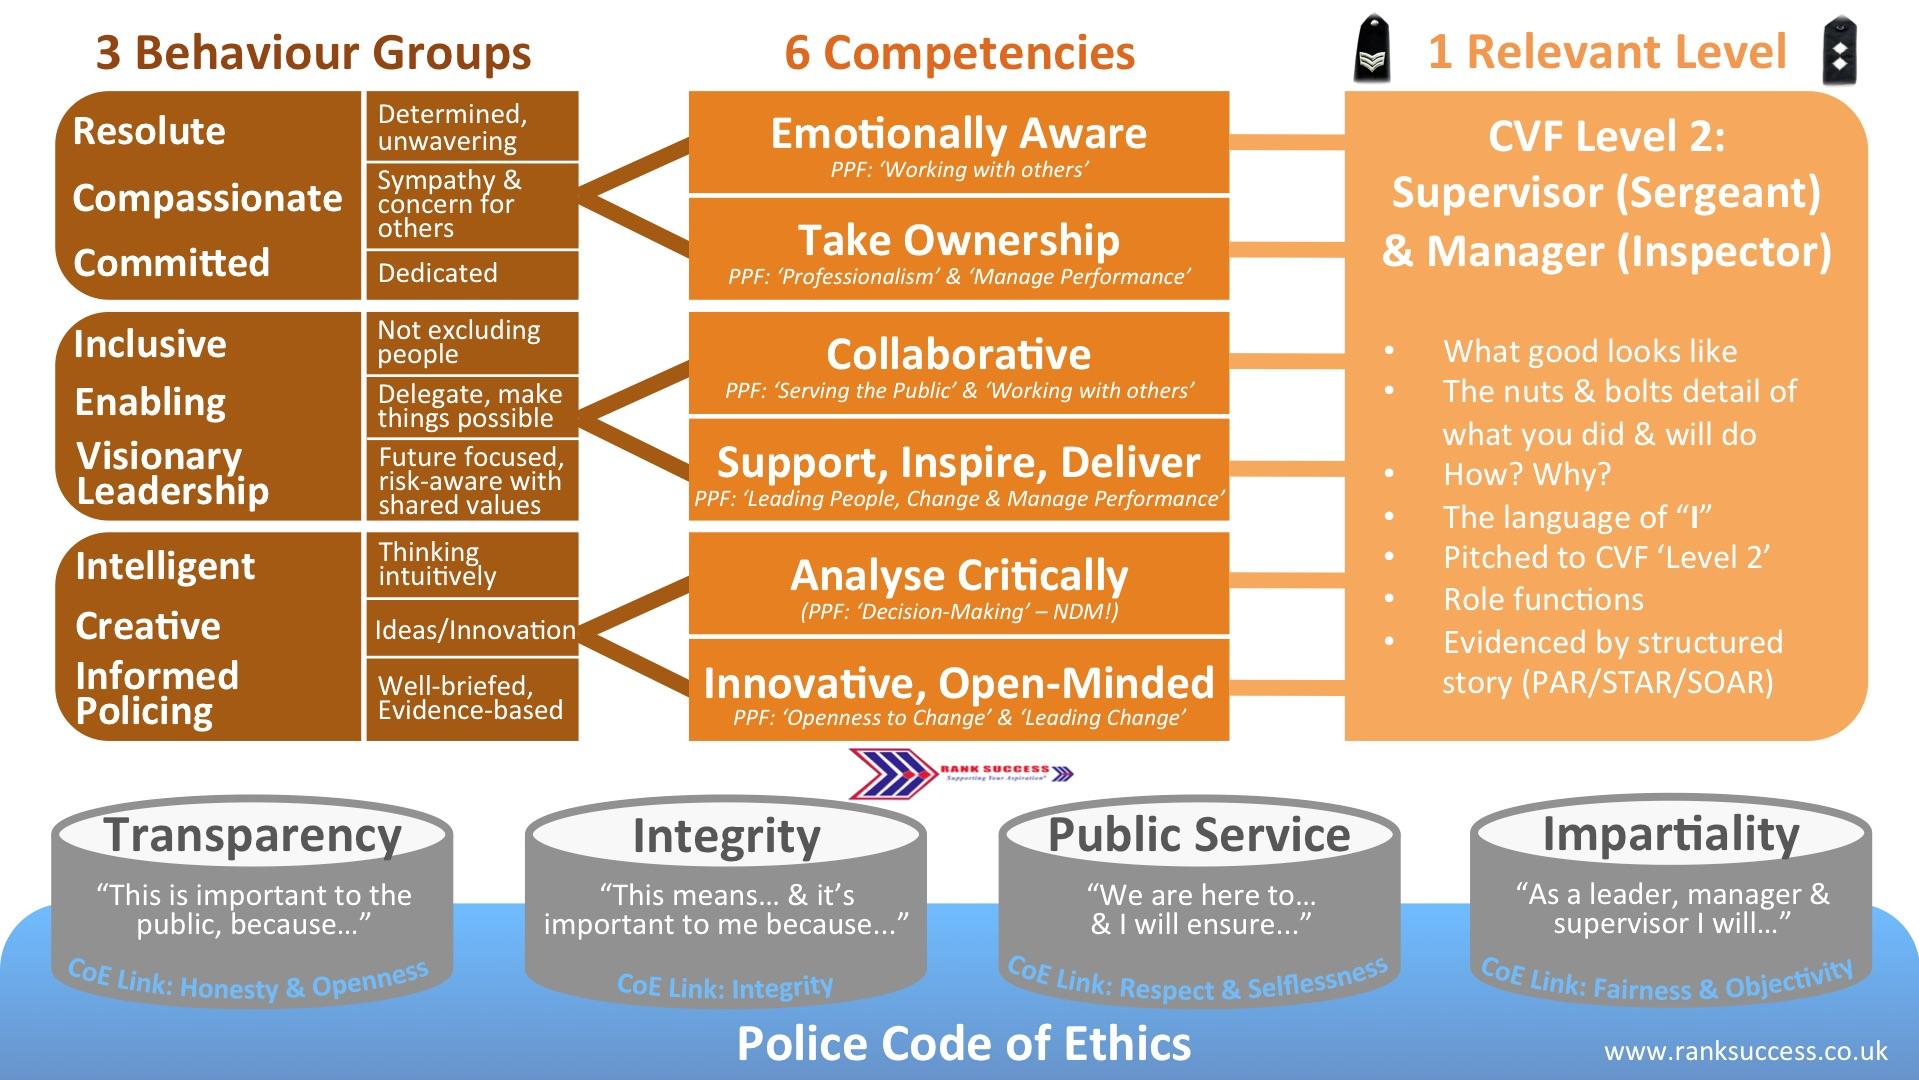 CVF promotion framework